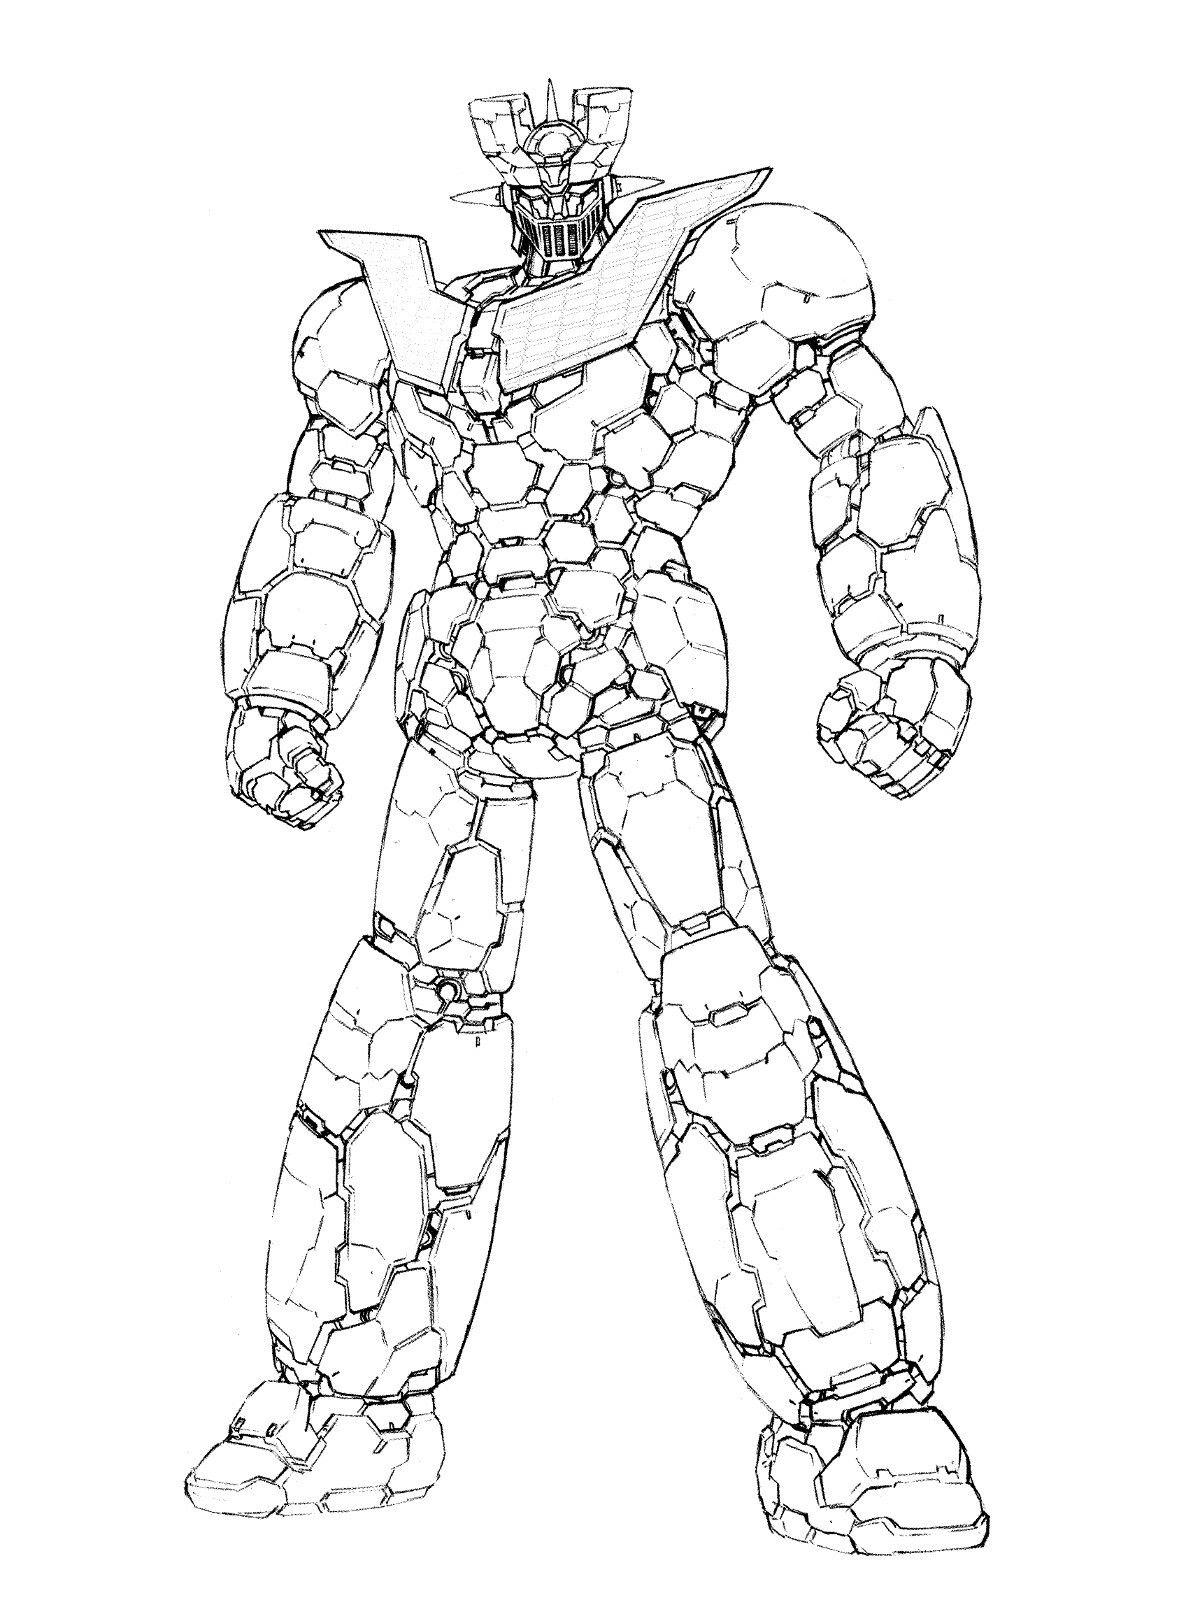 Pin by Šorgo Uroš on Chogokin | Pinterest | Super robot, Robot and Anime